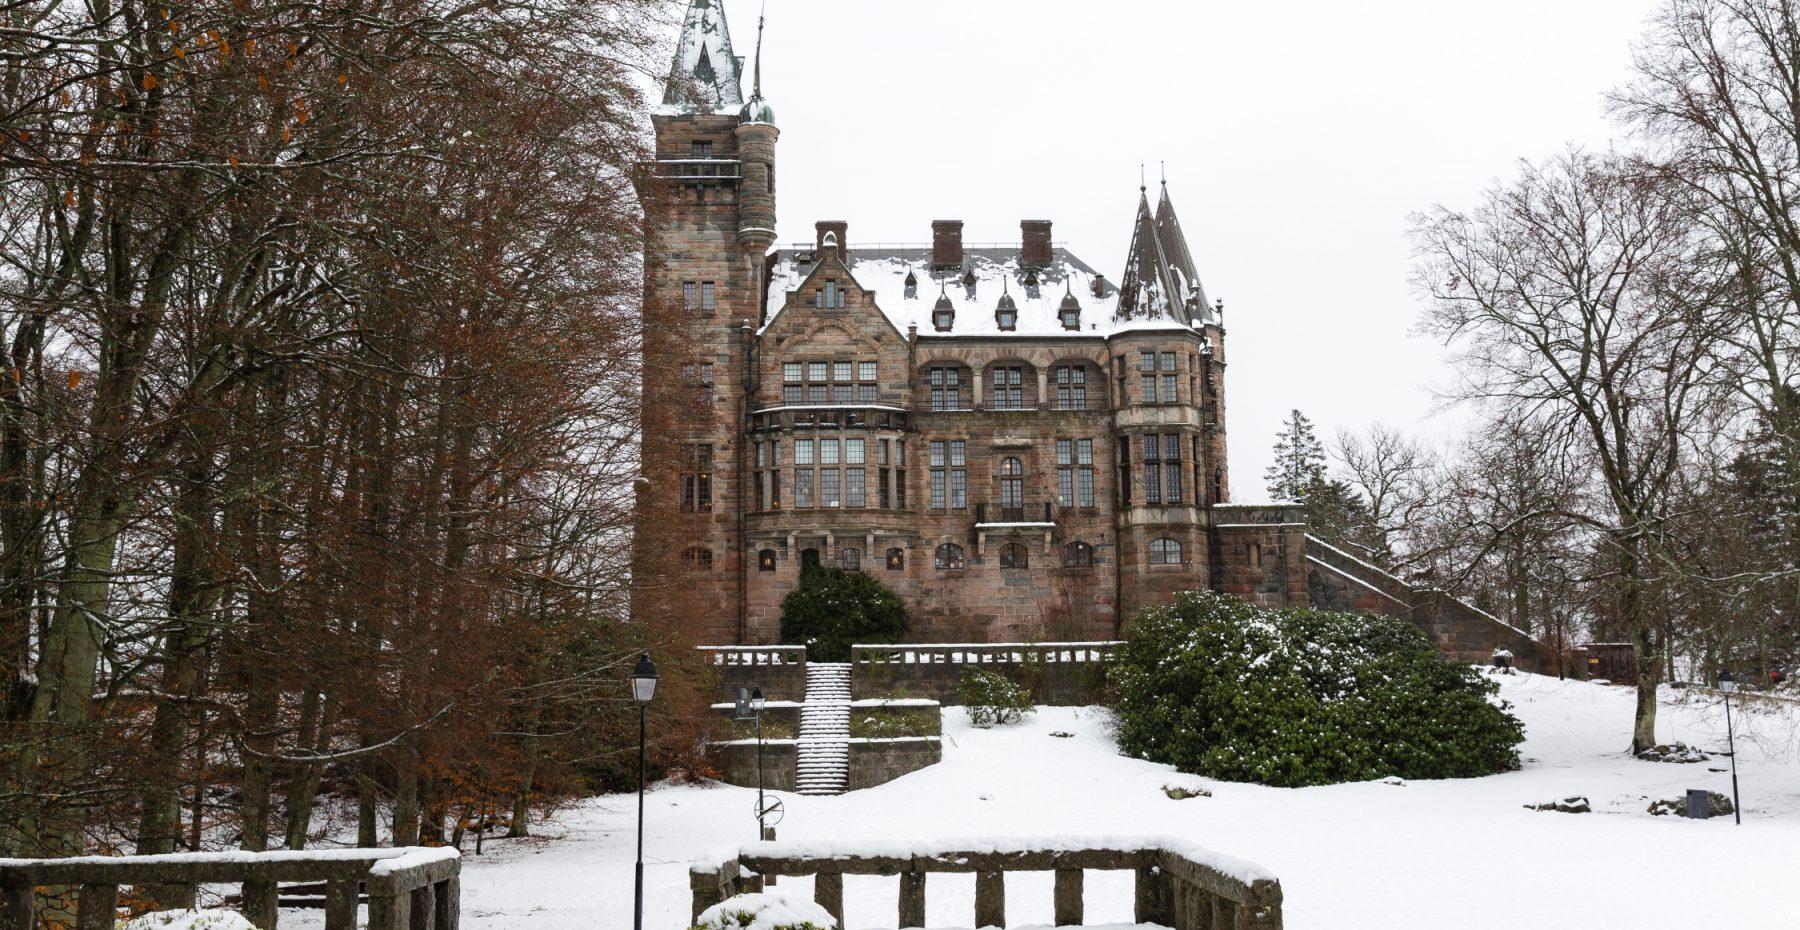 A designer hotel or a castle?